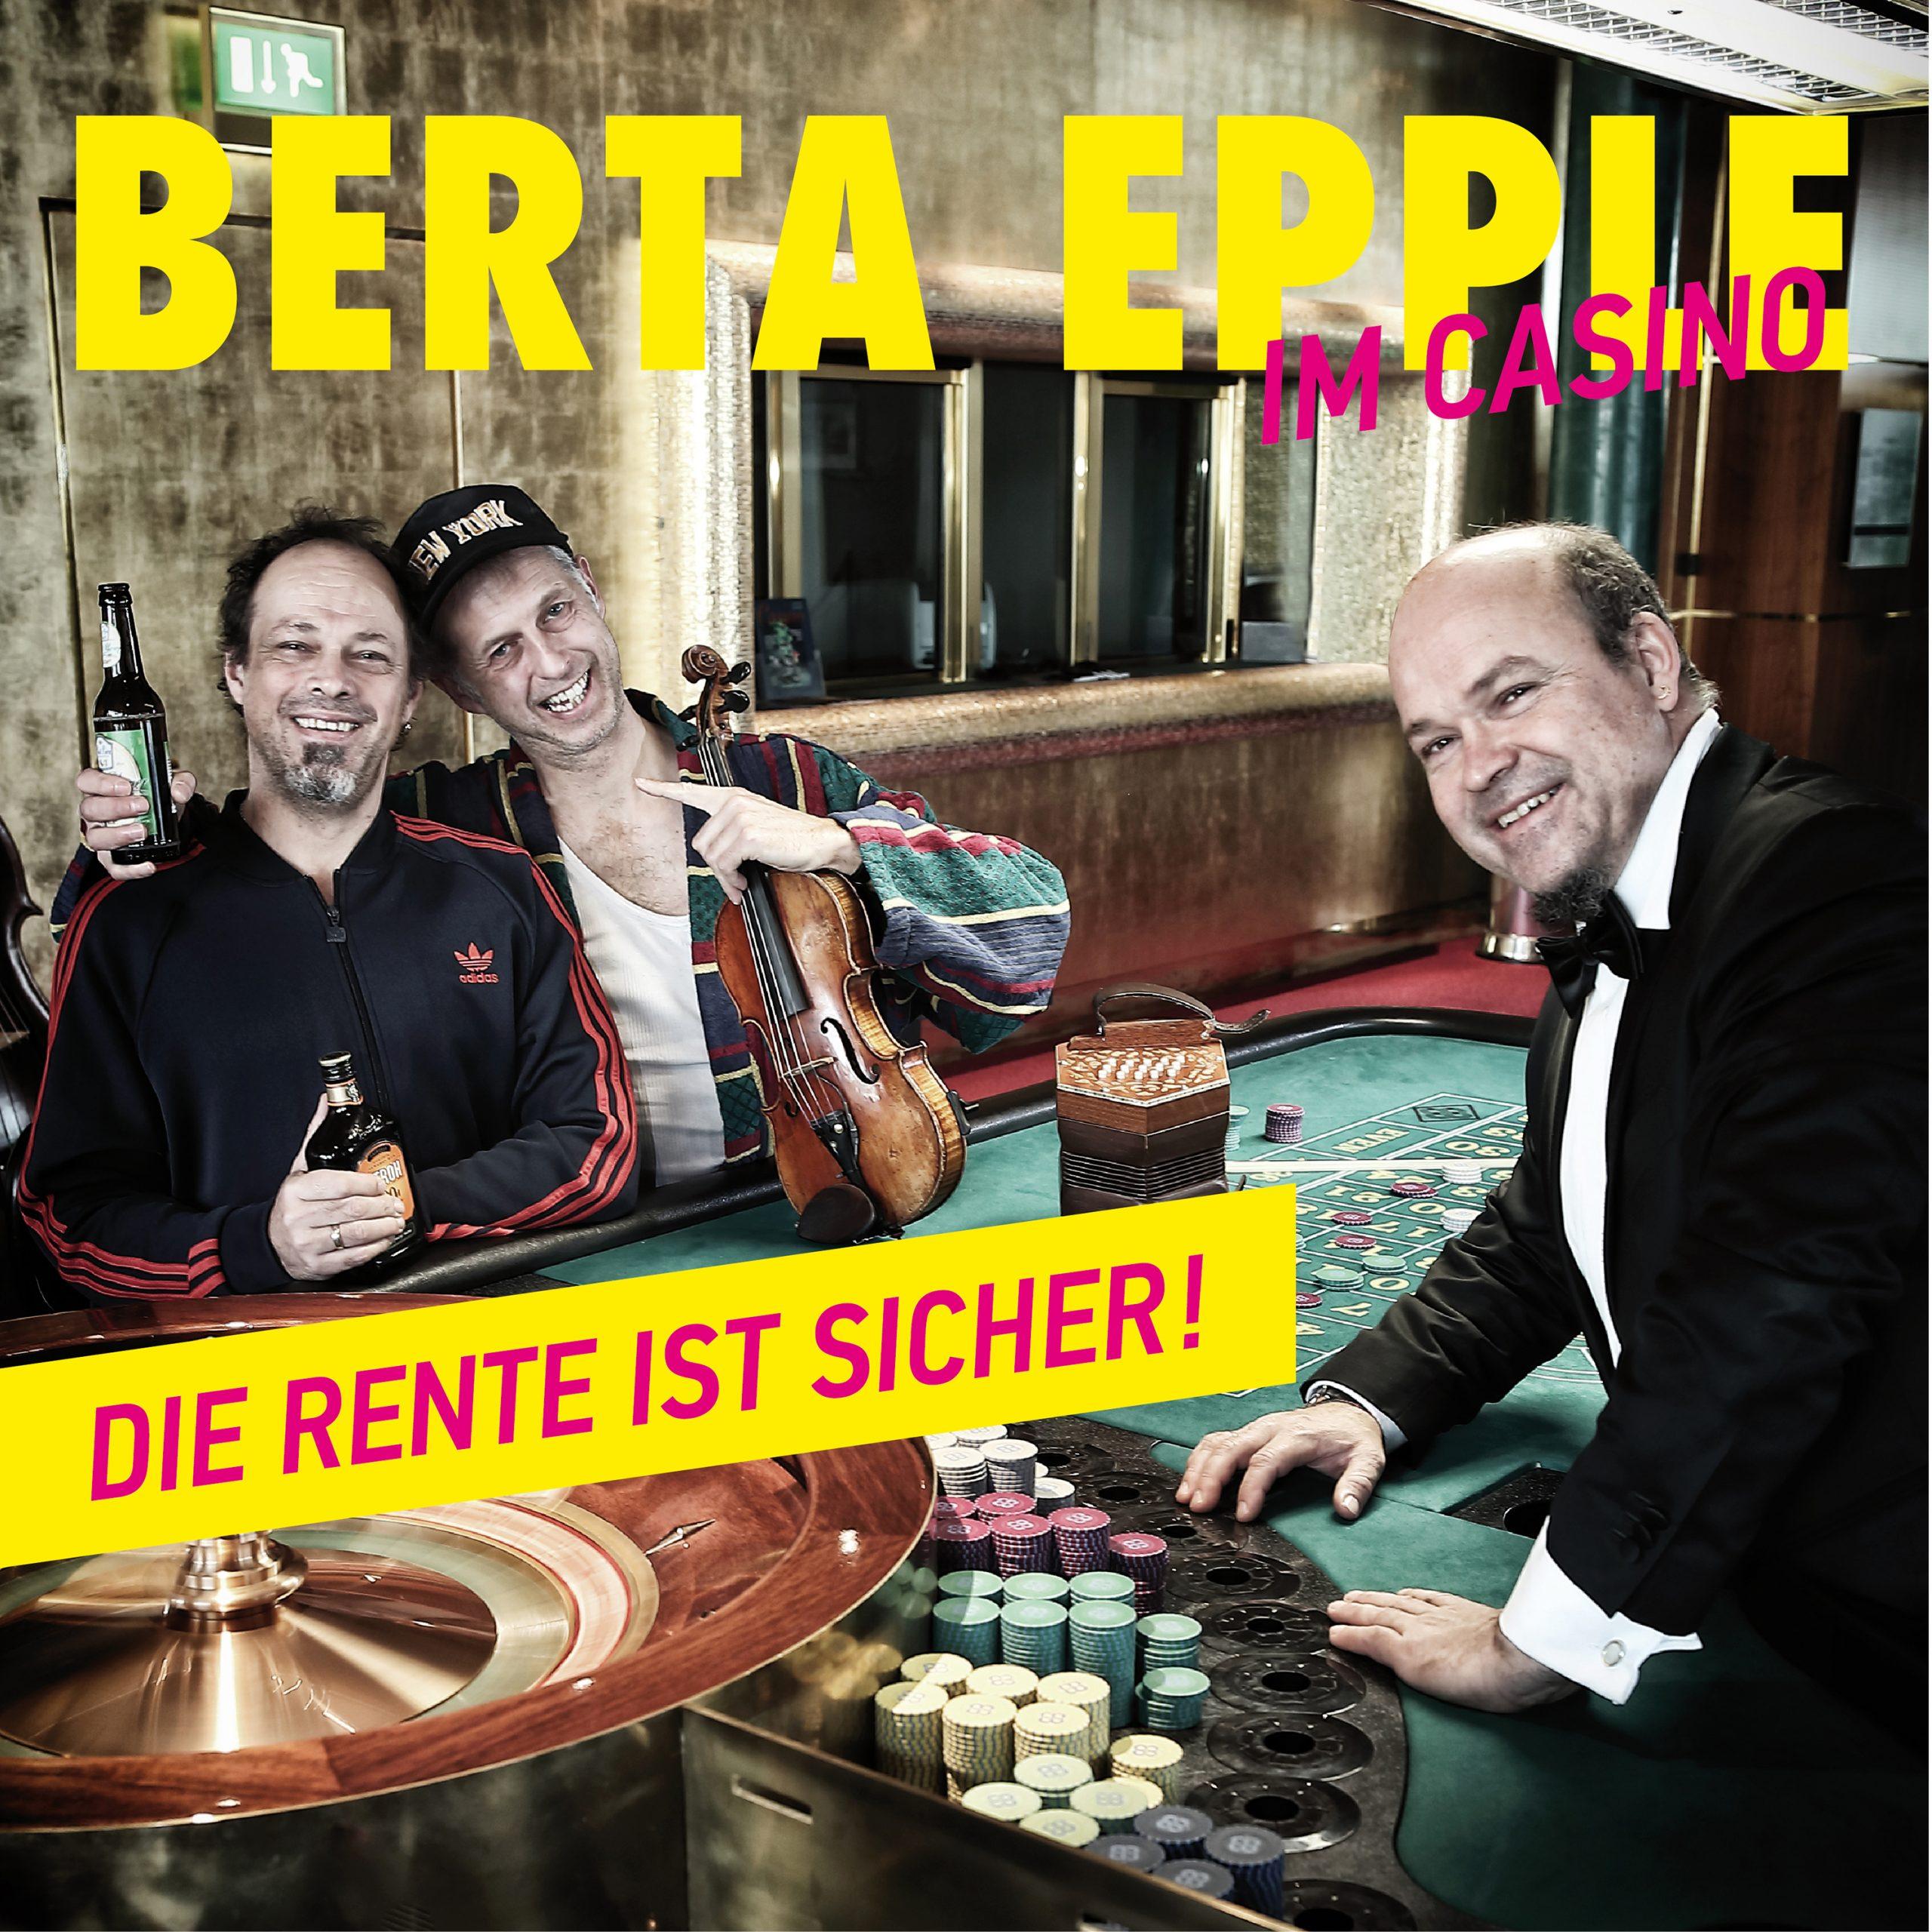 CD-Cover: BERTA EPPLE im Casino –Die Rente ist sicher!